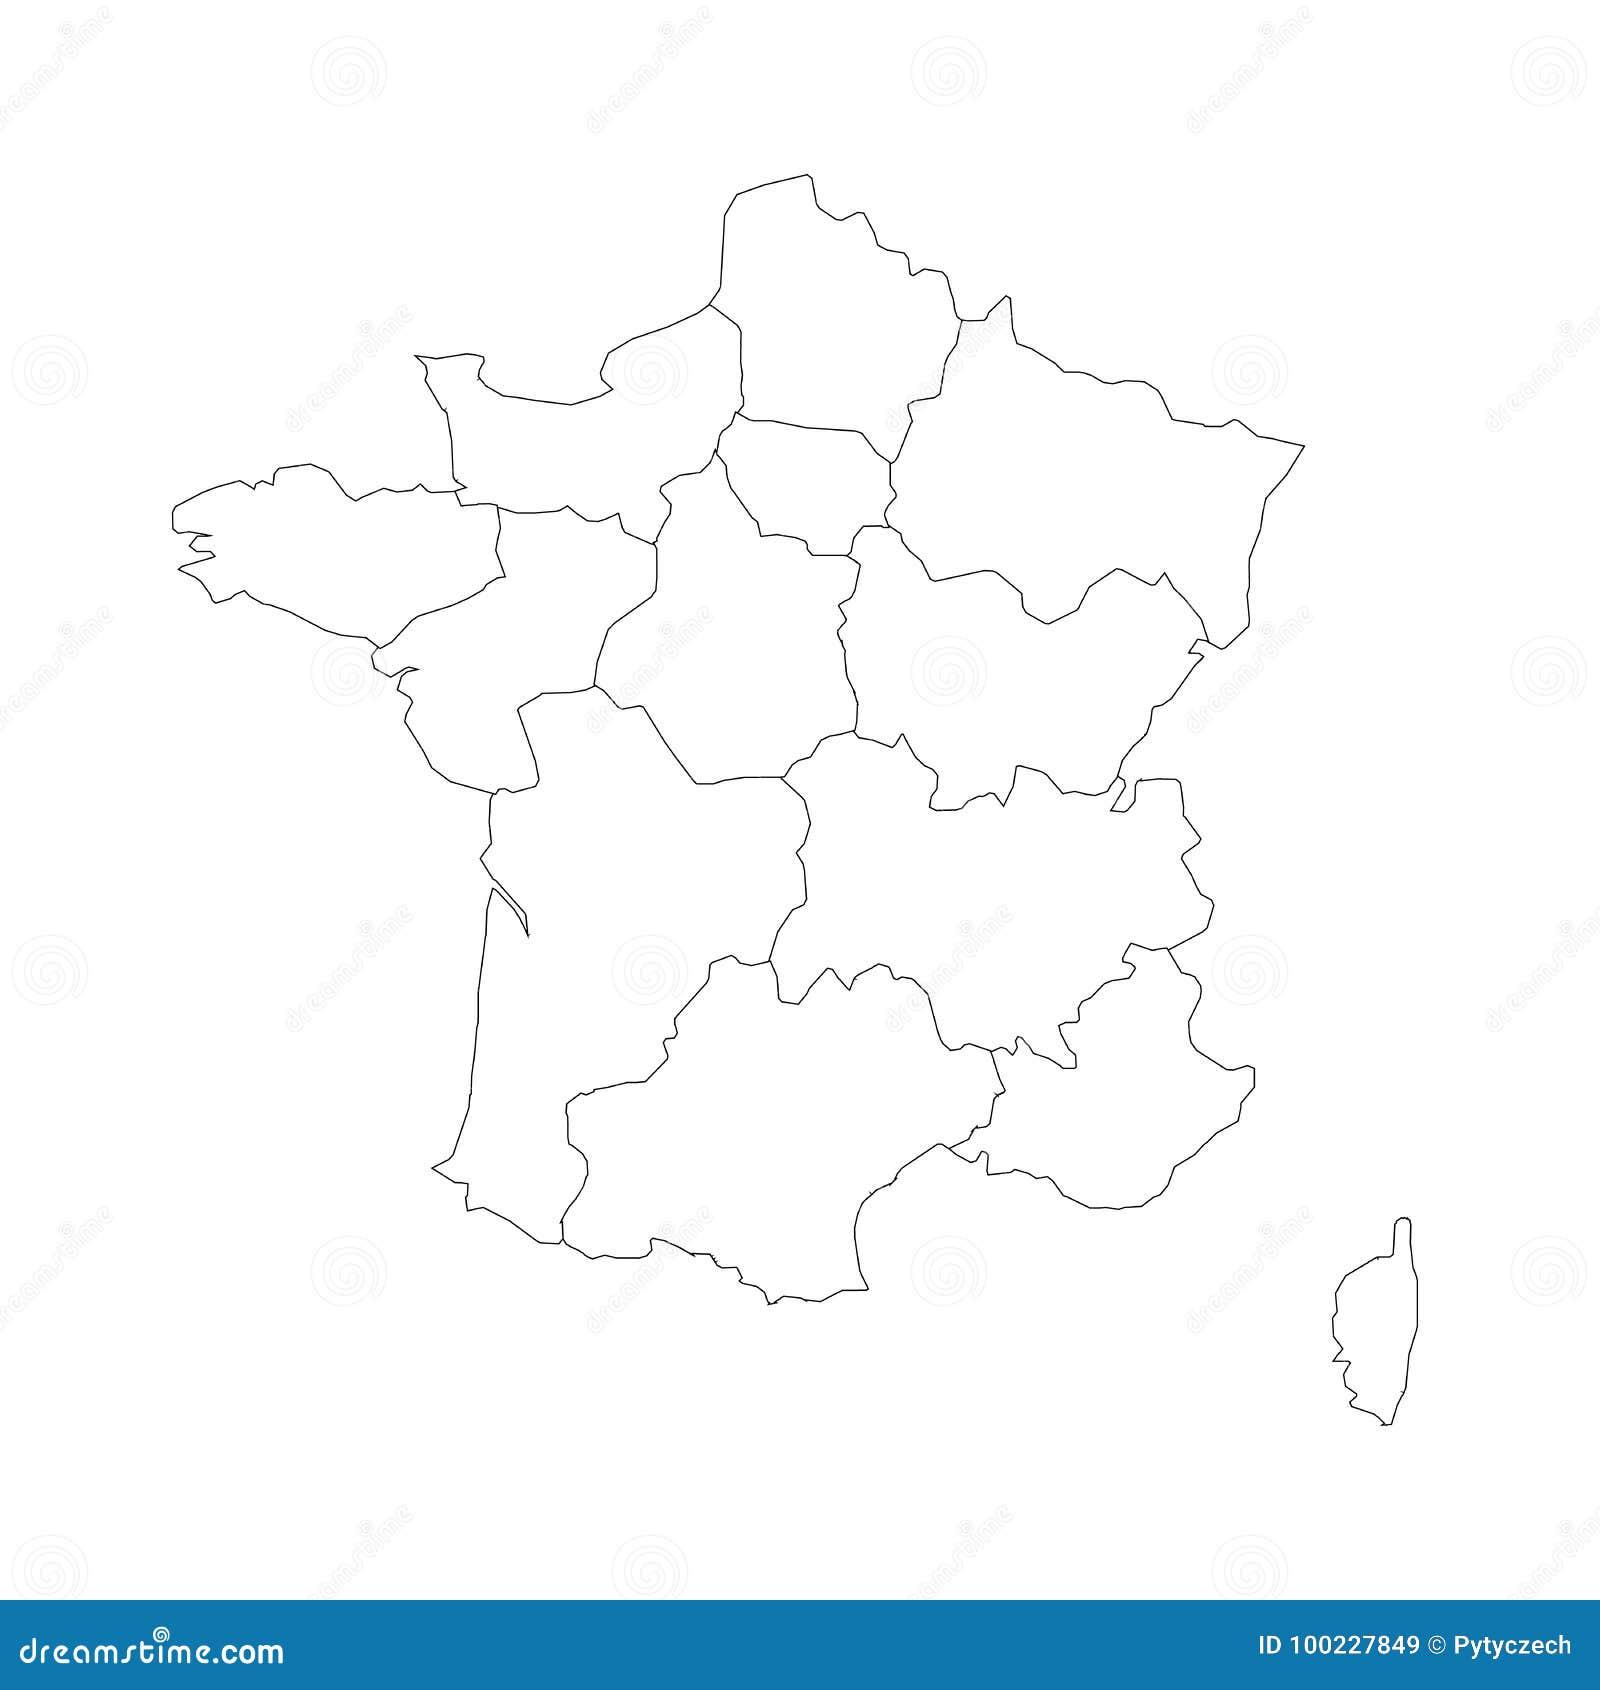 Outline Of Map Of France.Outline Map Of France Divided Into 13 Administrative Metropolitan